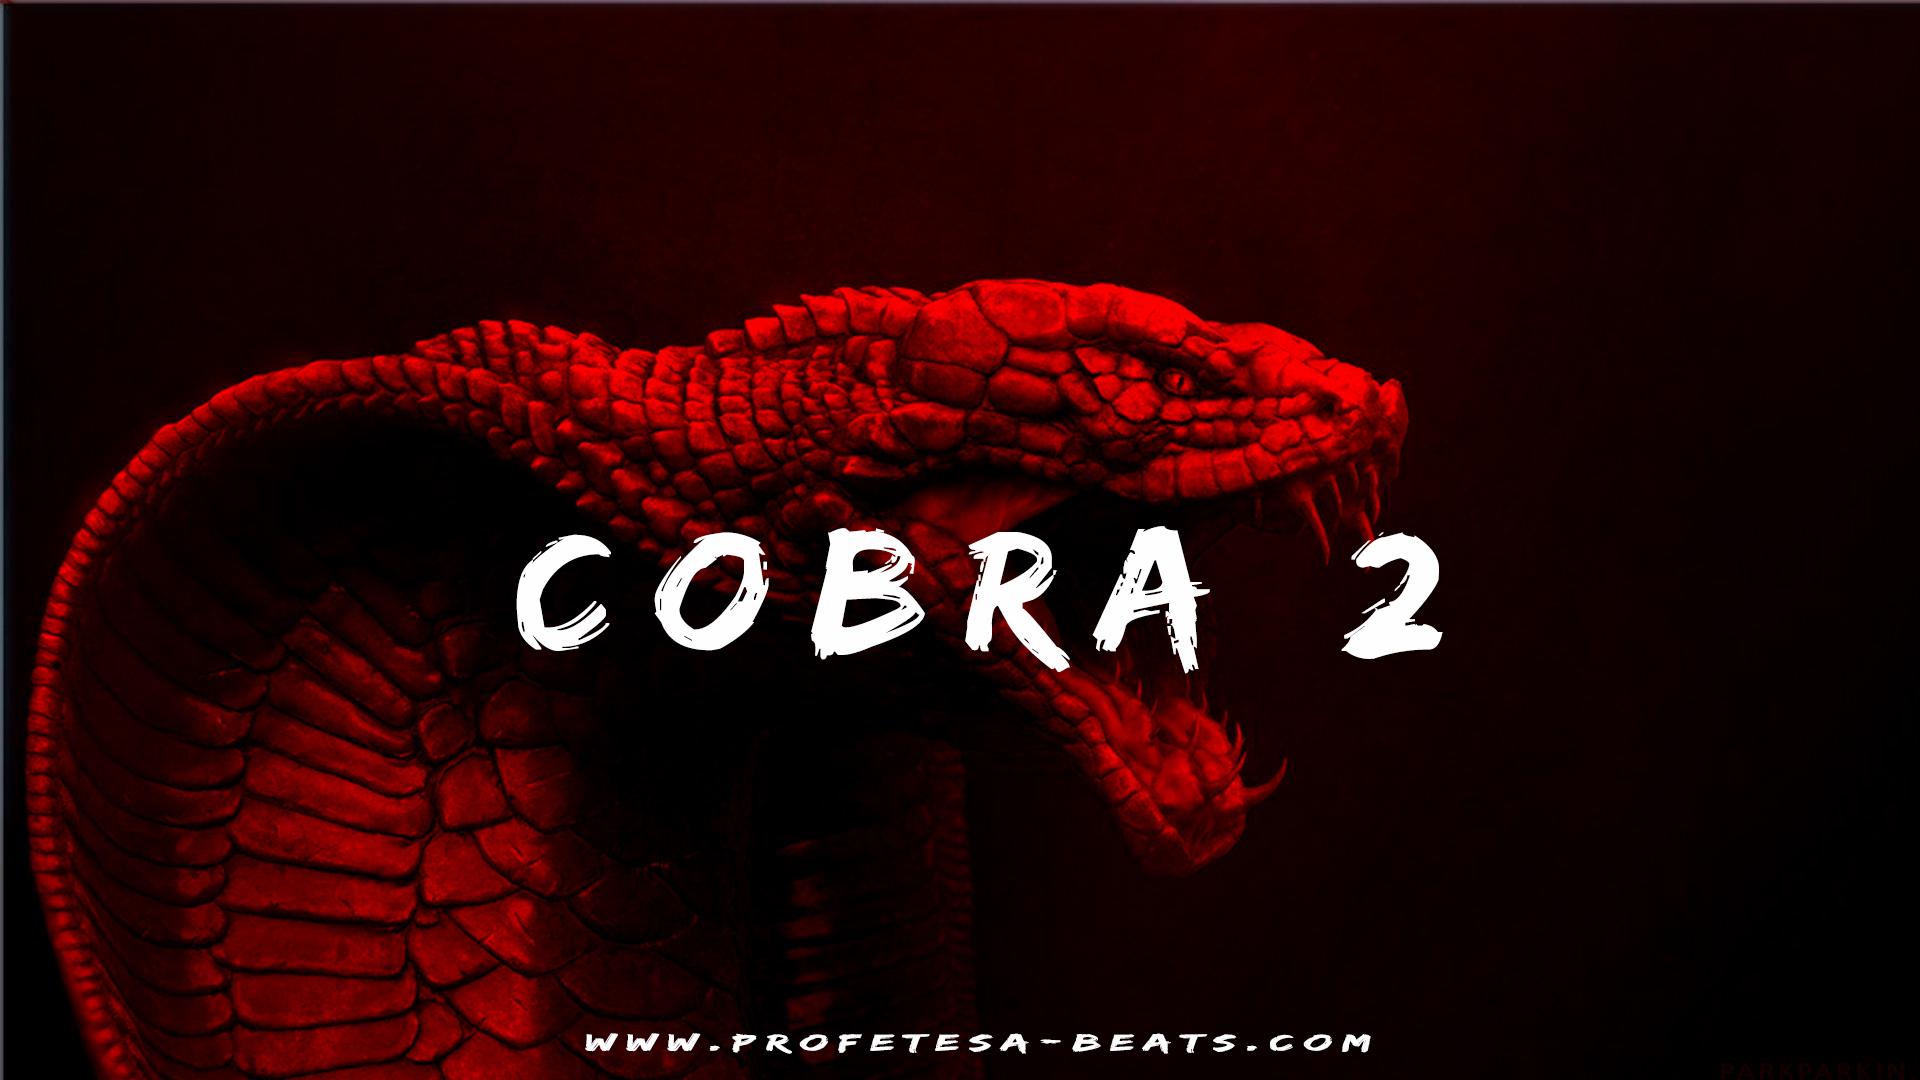 Cobra pt. 2